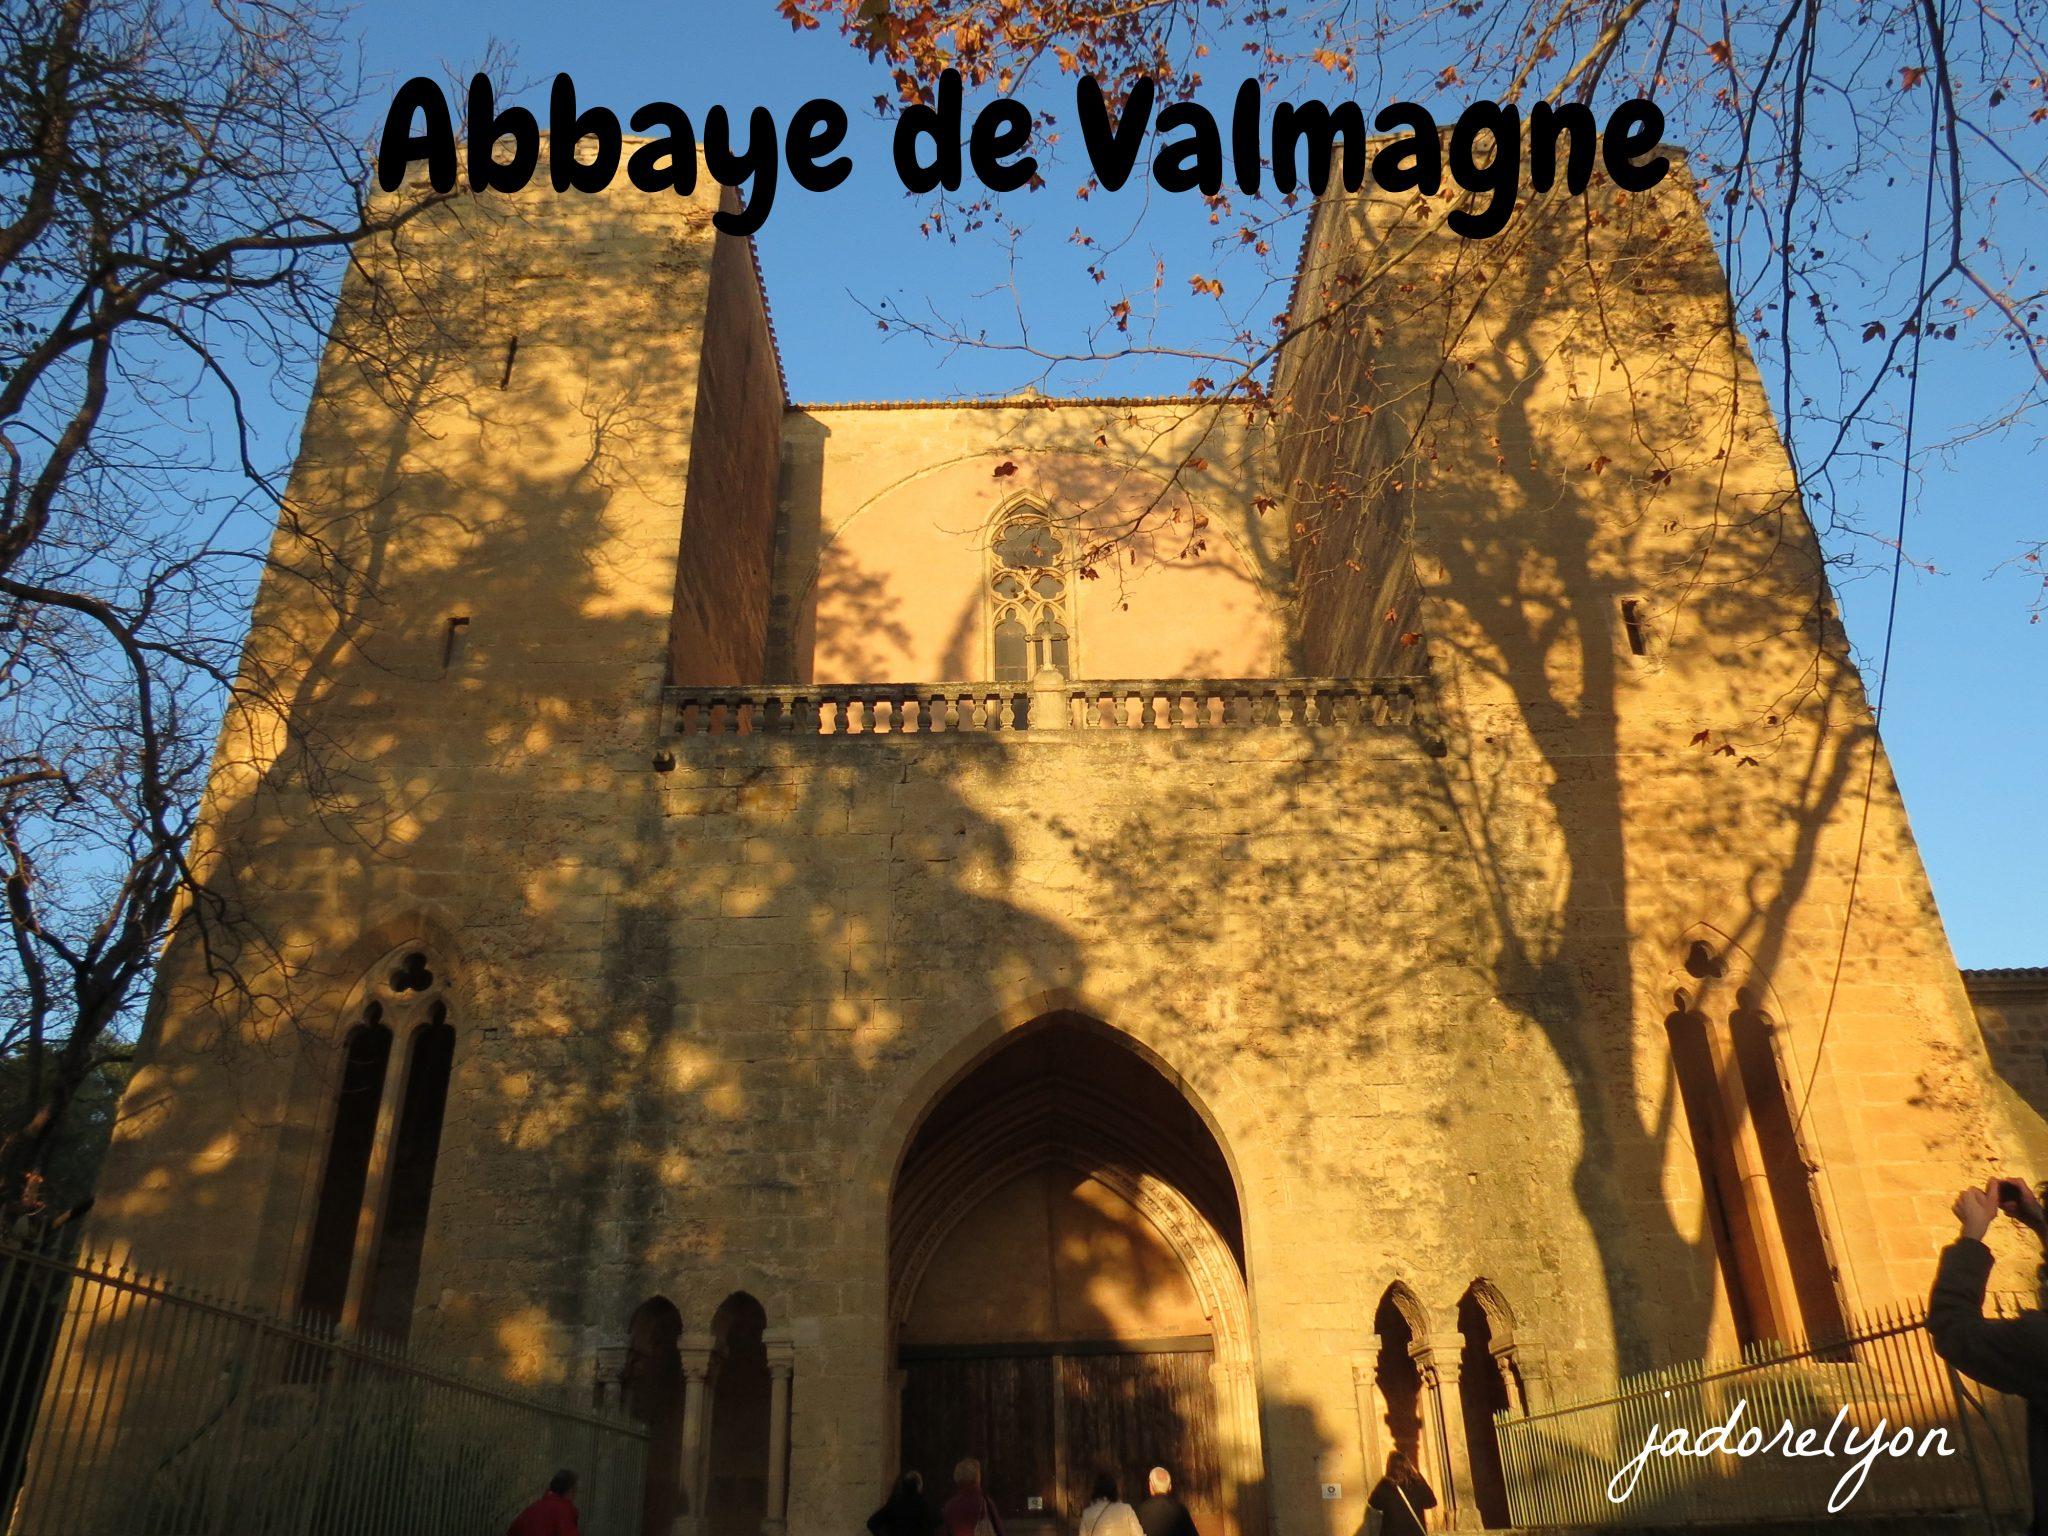 Abbaye de Valmagne, Languedoc.